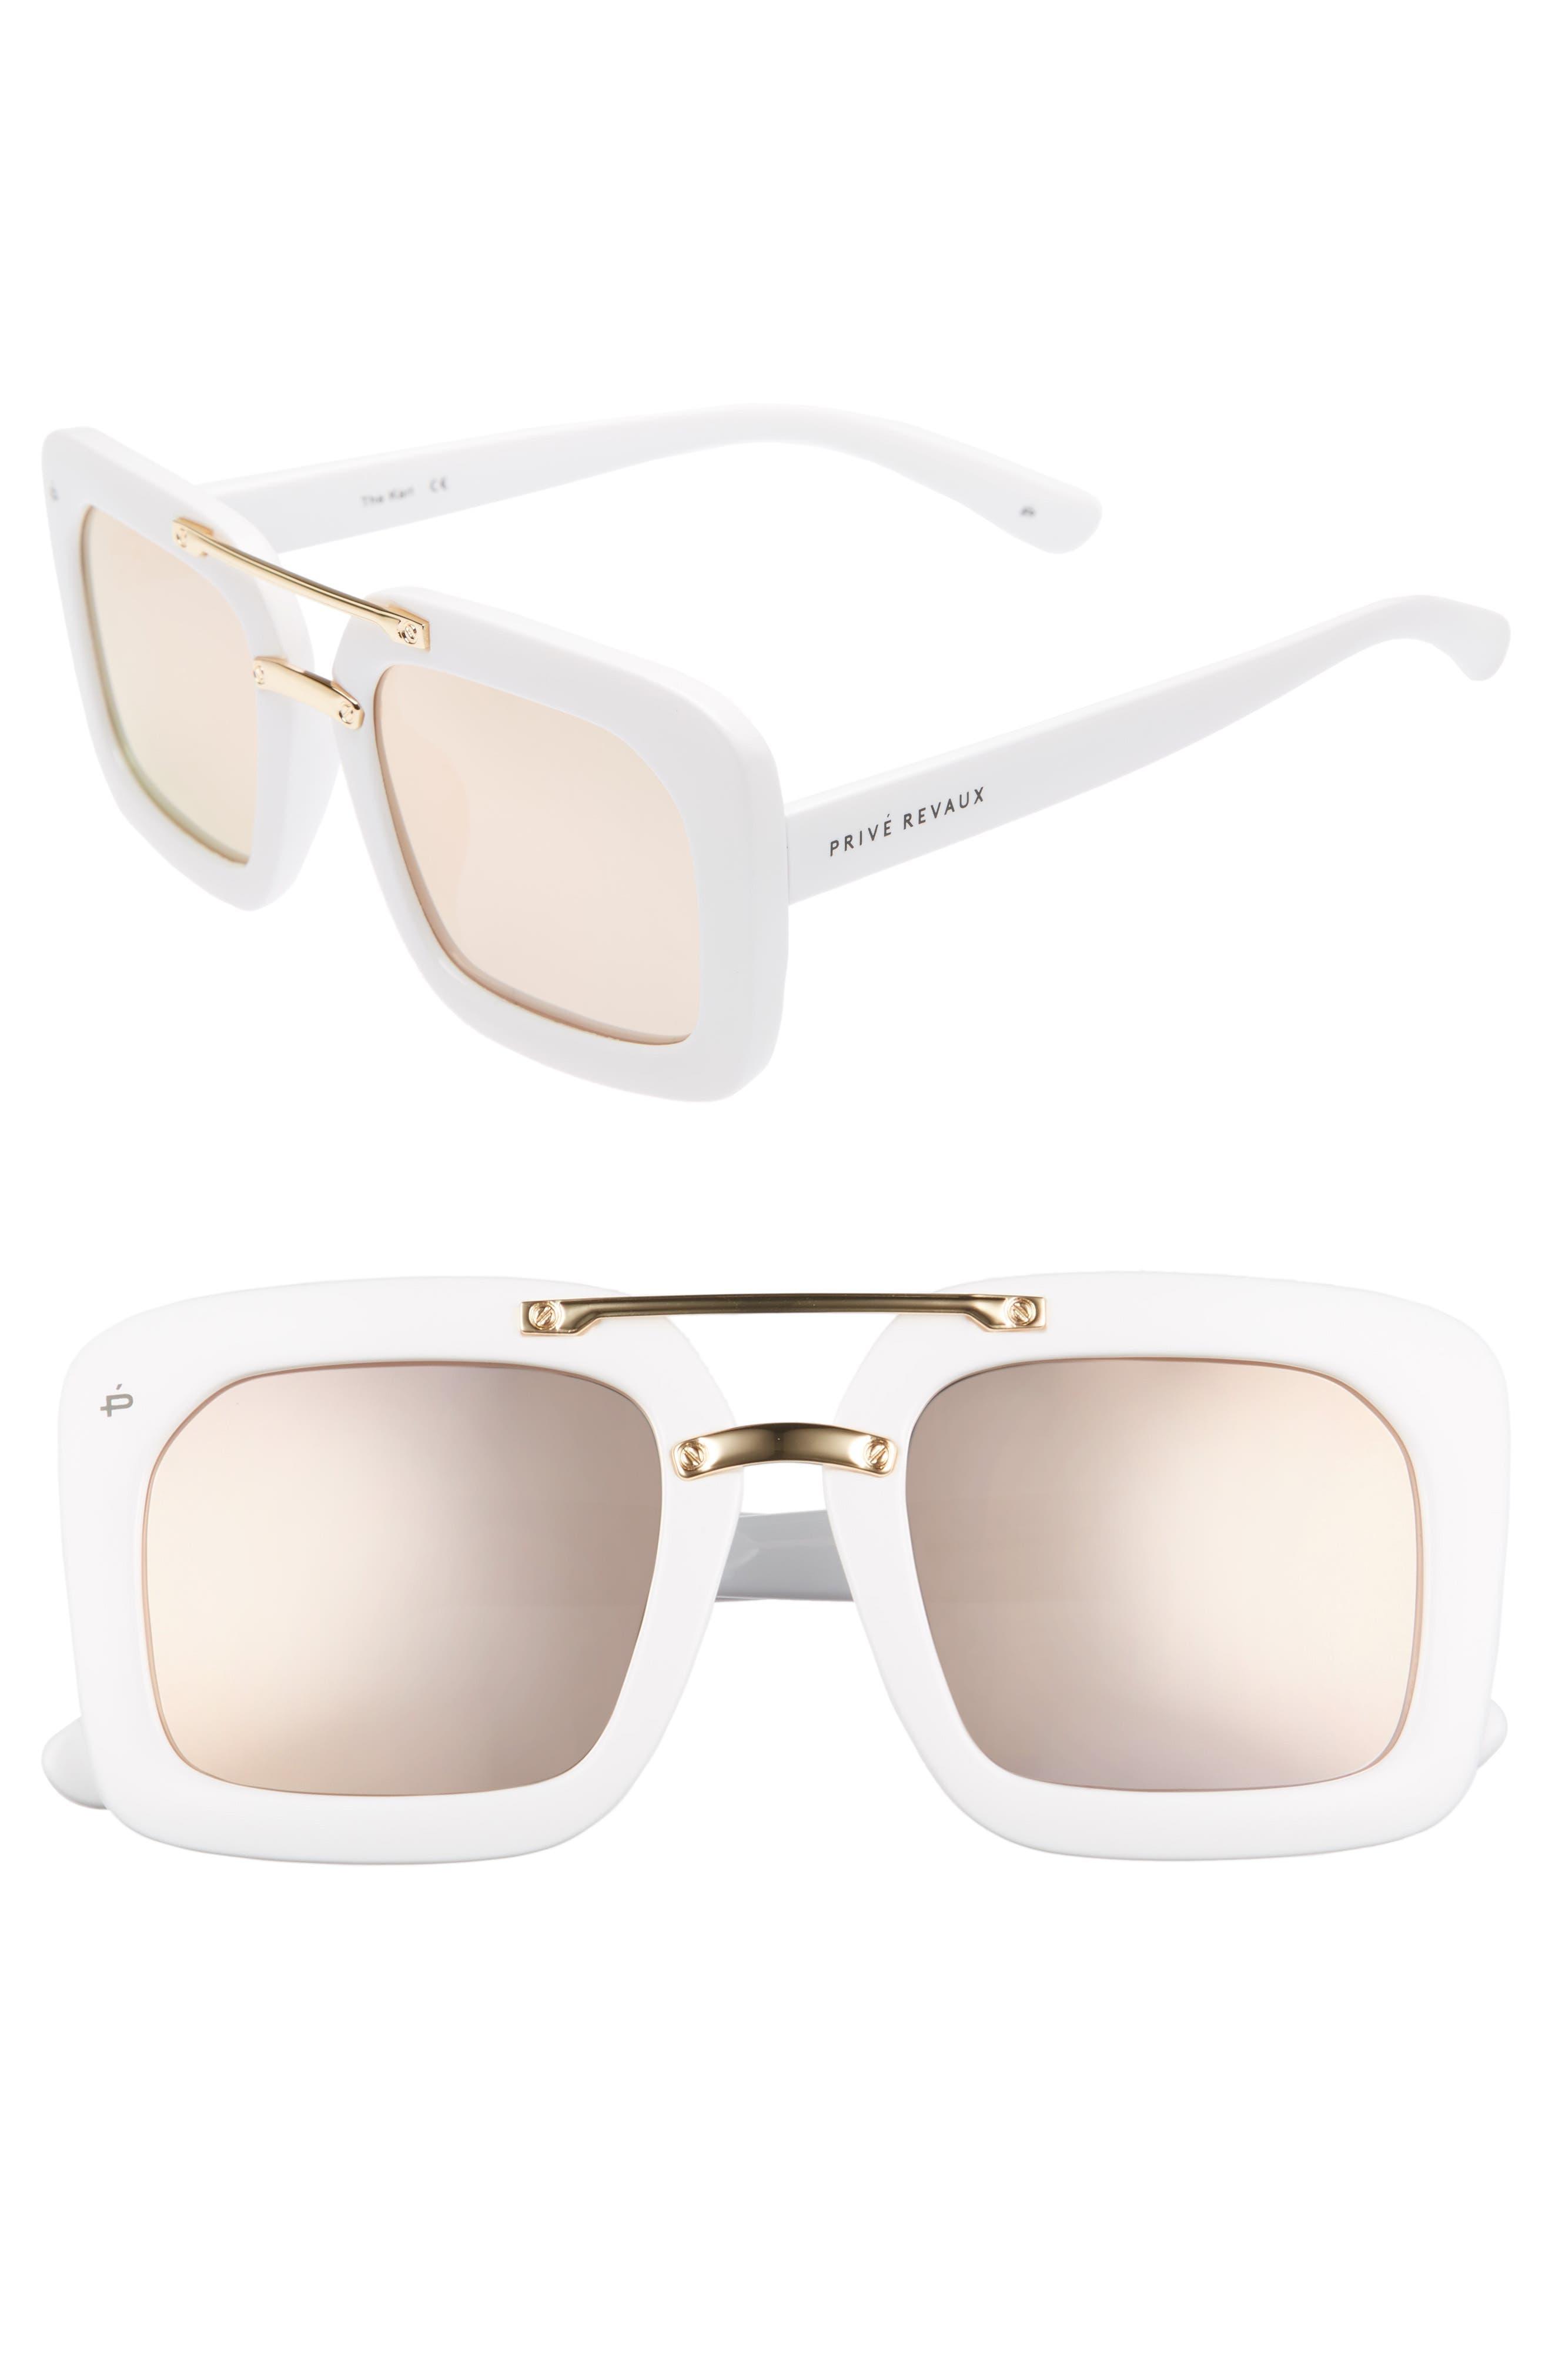 Privé Revaux The Karl 50mm Square Aviator Sunglasses,                         Main,                         color, White Polarized